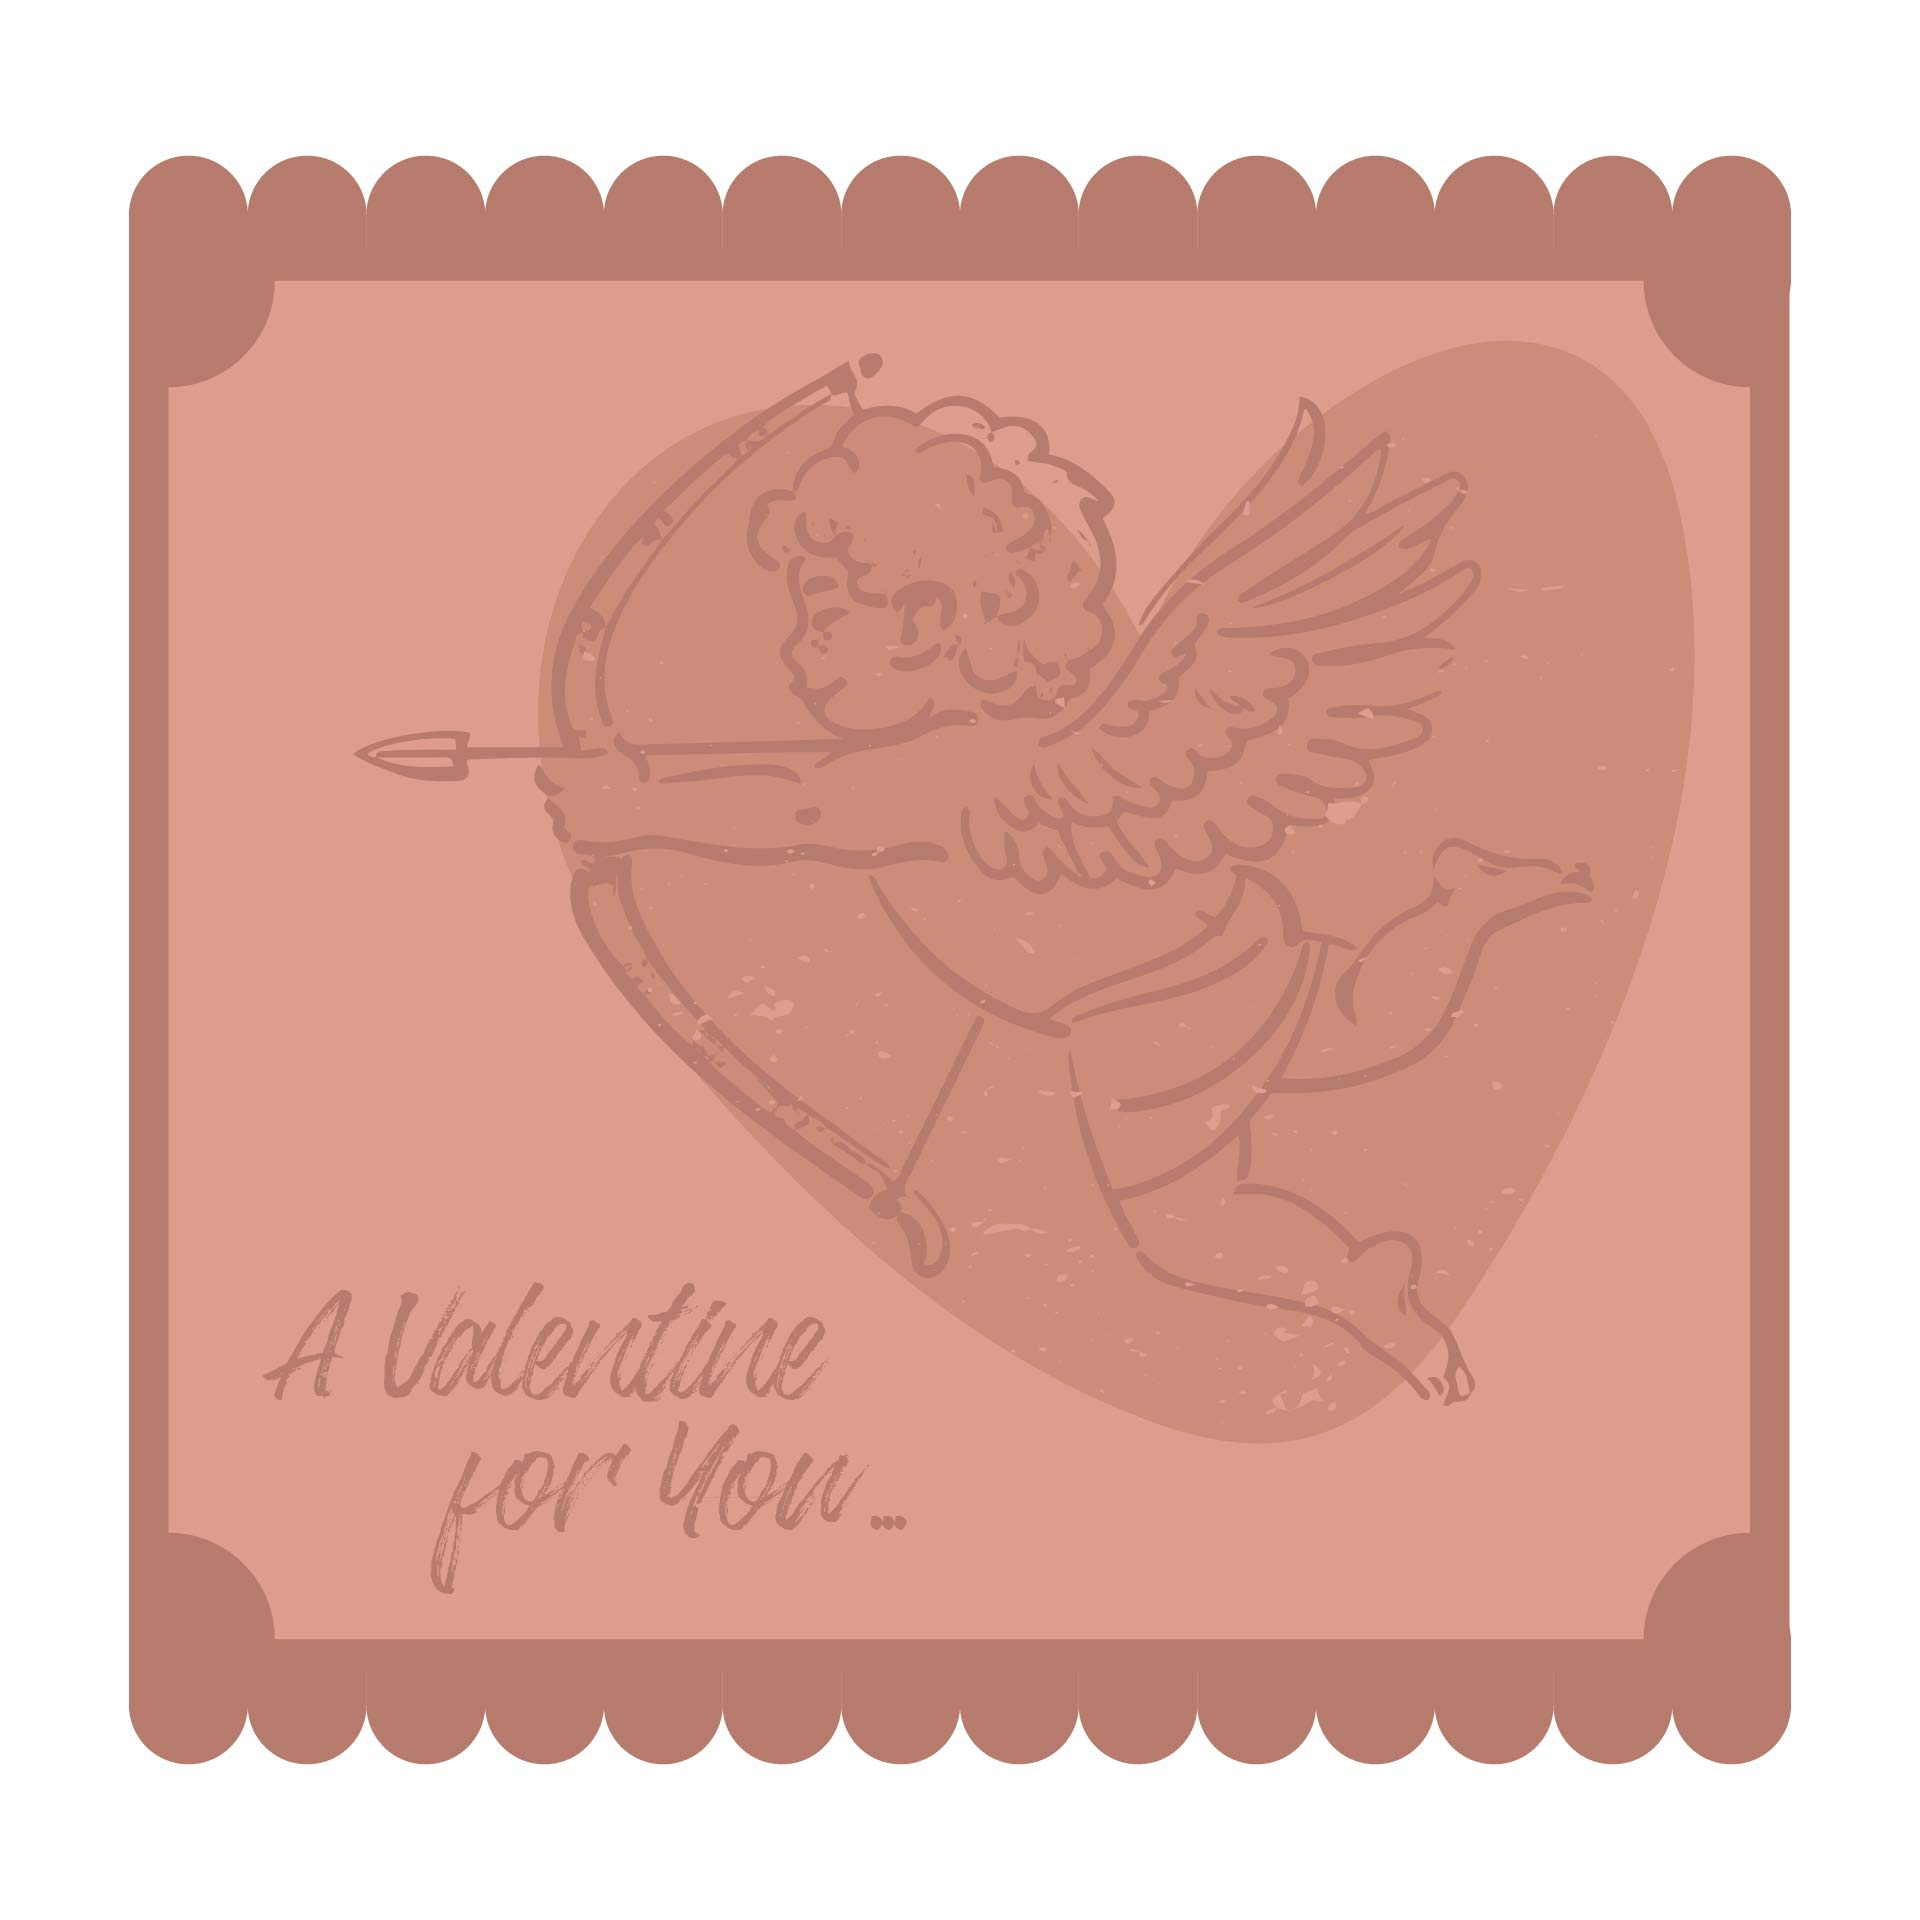 7 Best Images of Free Printable Vintage Valentine Cards ...